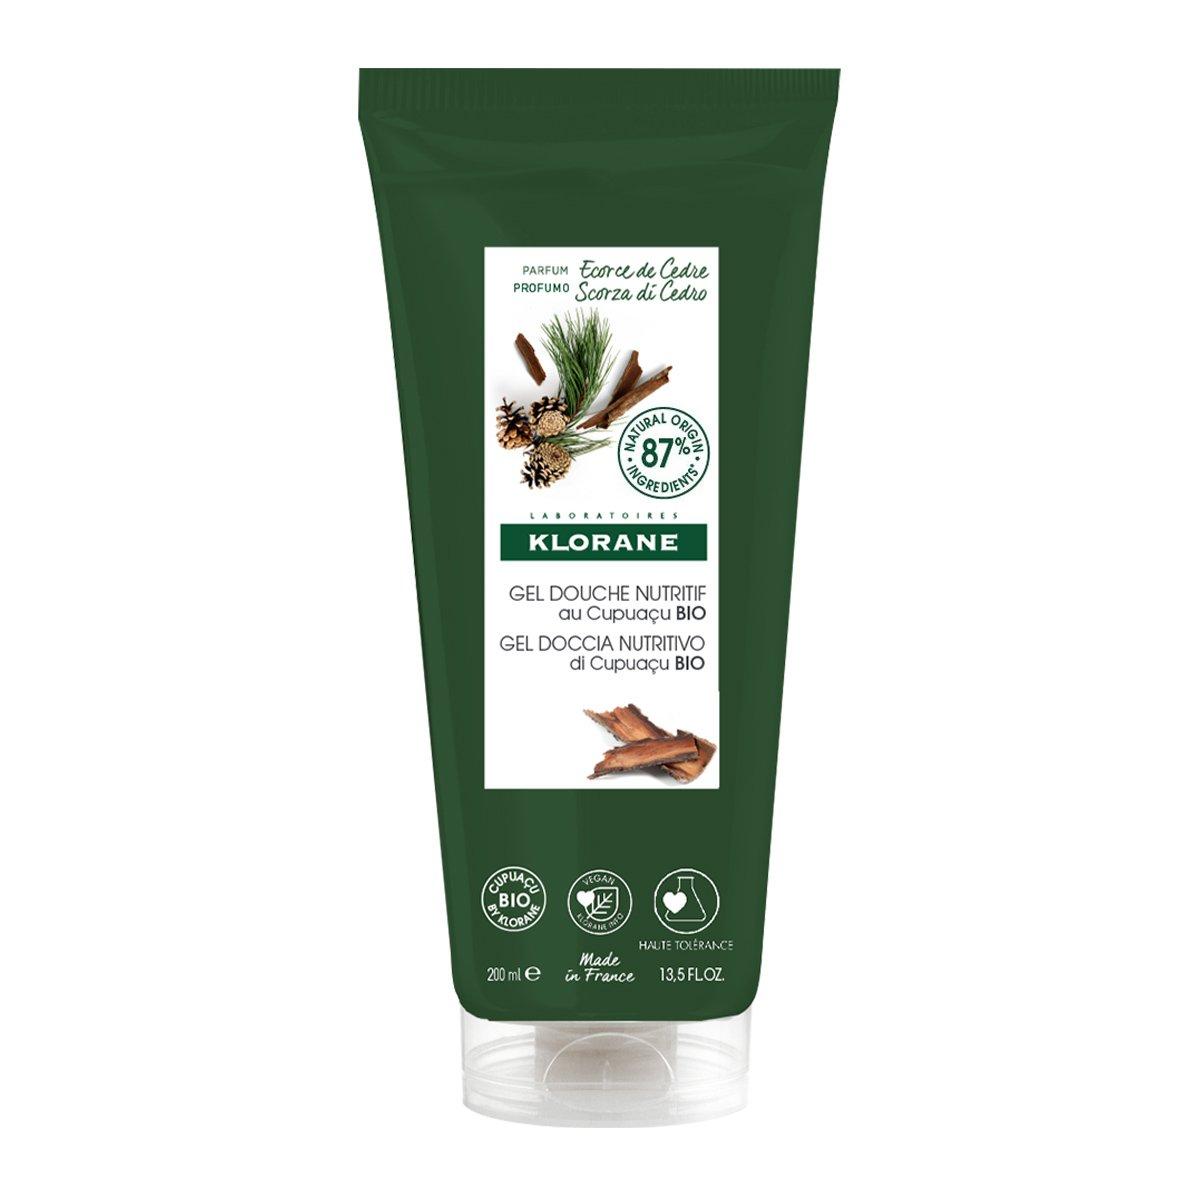 Klorane Cedar Nourishing Shower Gel Θρεπτικό Gel Αφρόλουτρο με Βιολογικό Βούτυρο Cupuacu & Άρωμα Φλοιού Κέδρου 200ml